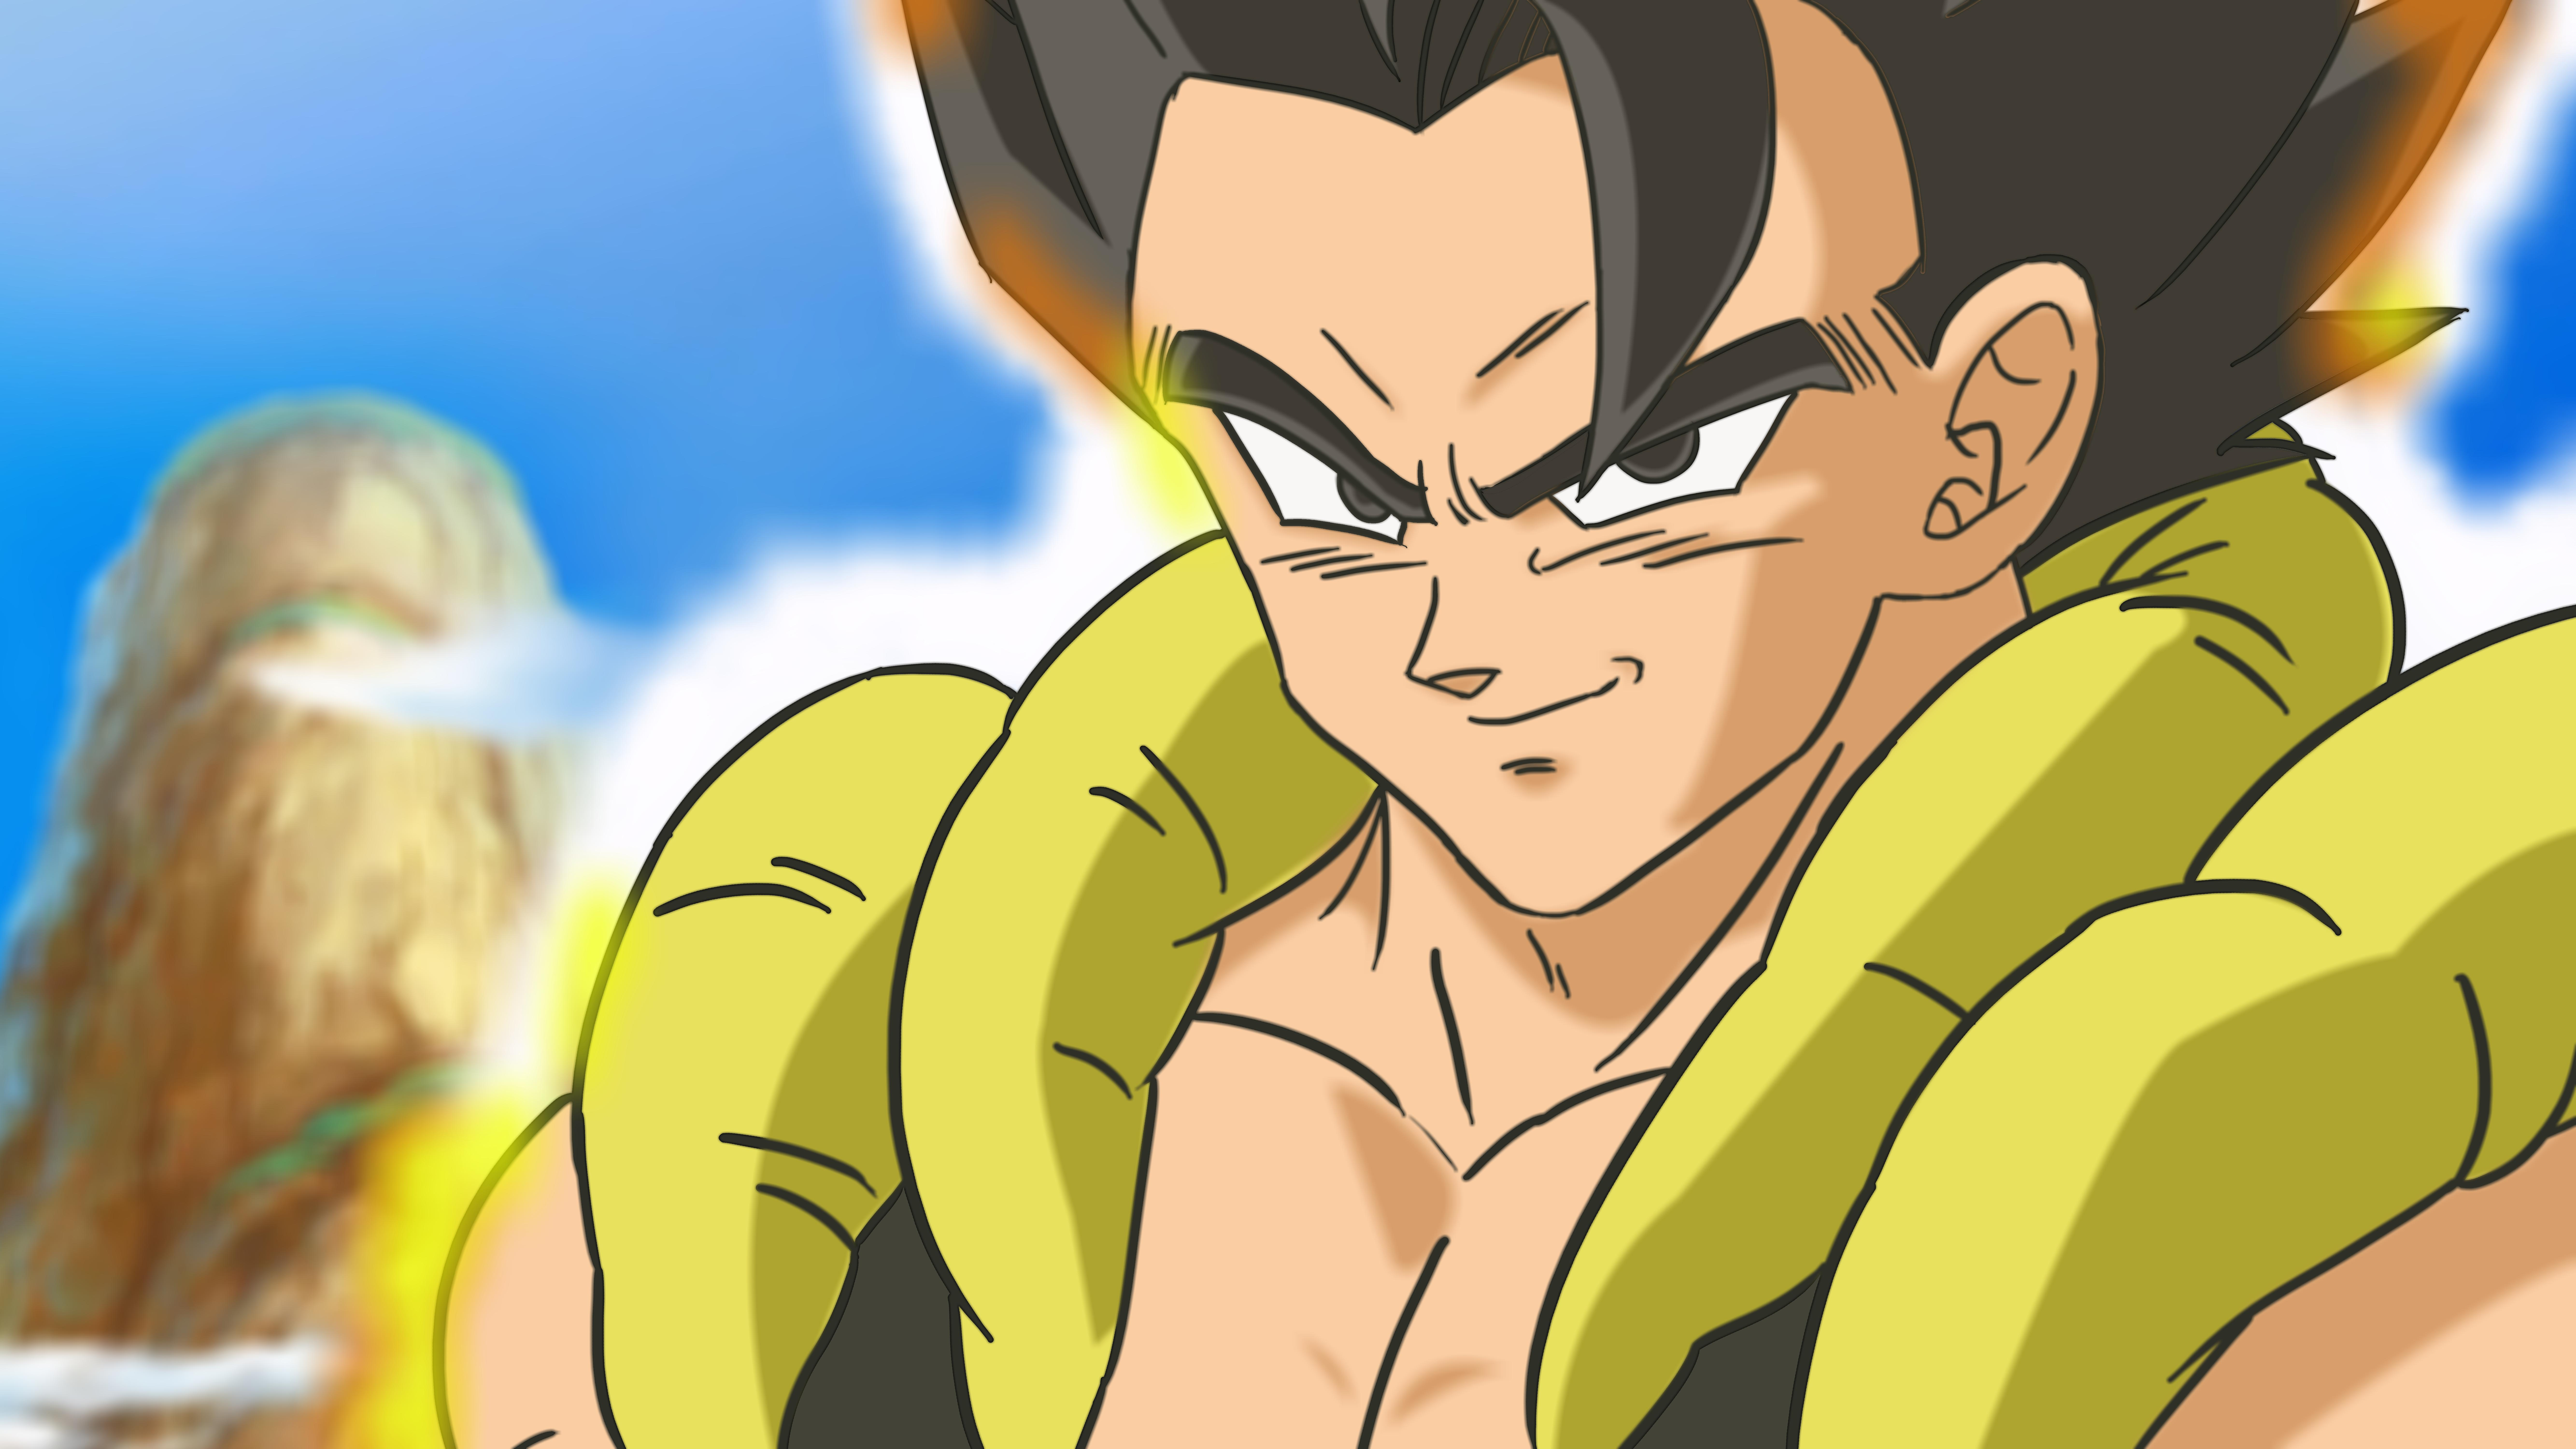 Dragon Ball Super Gogeta 8k Ultra Hd Wallpaper Background Image